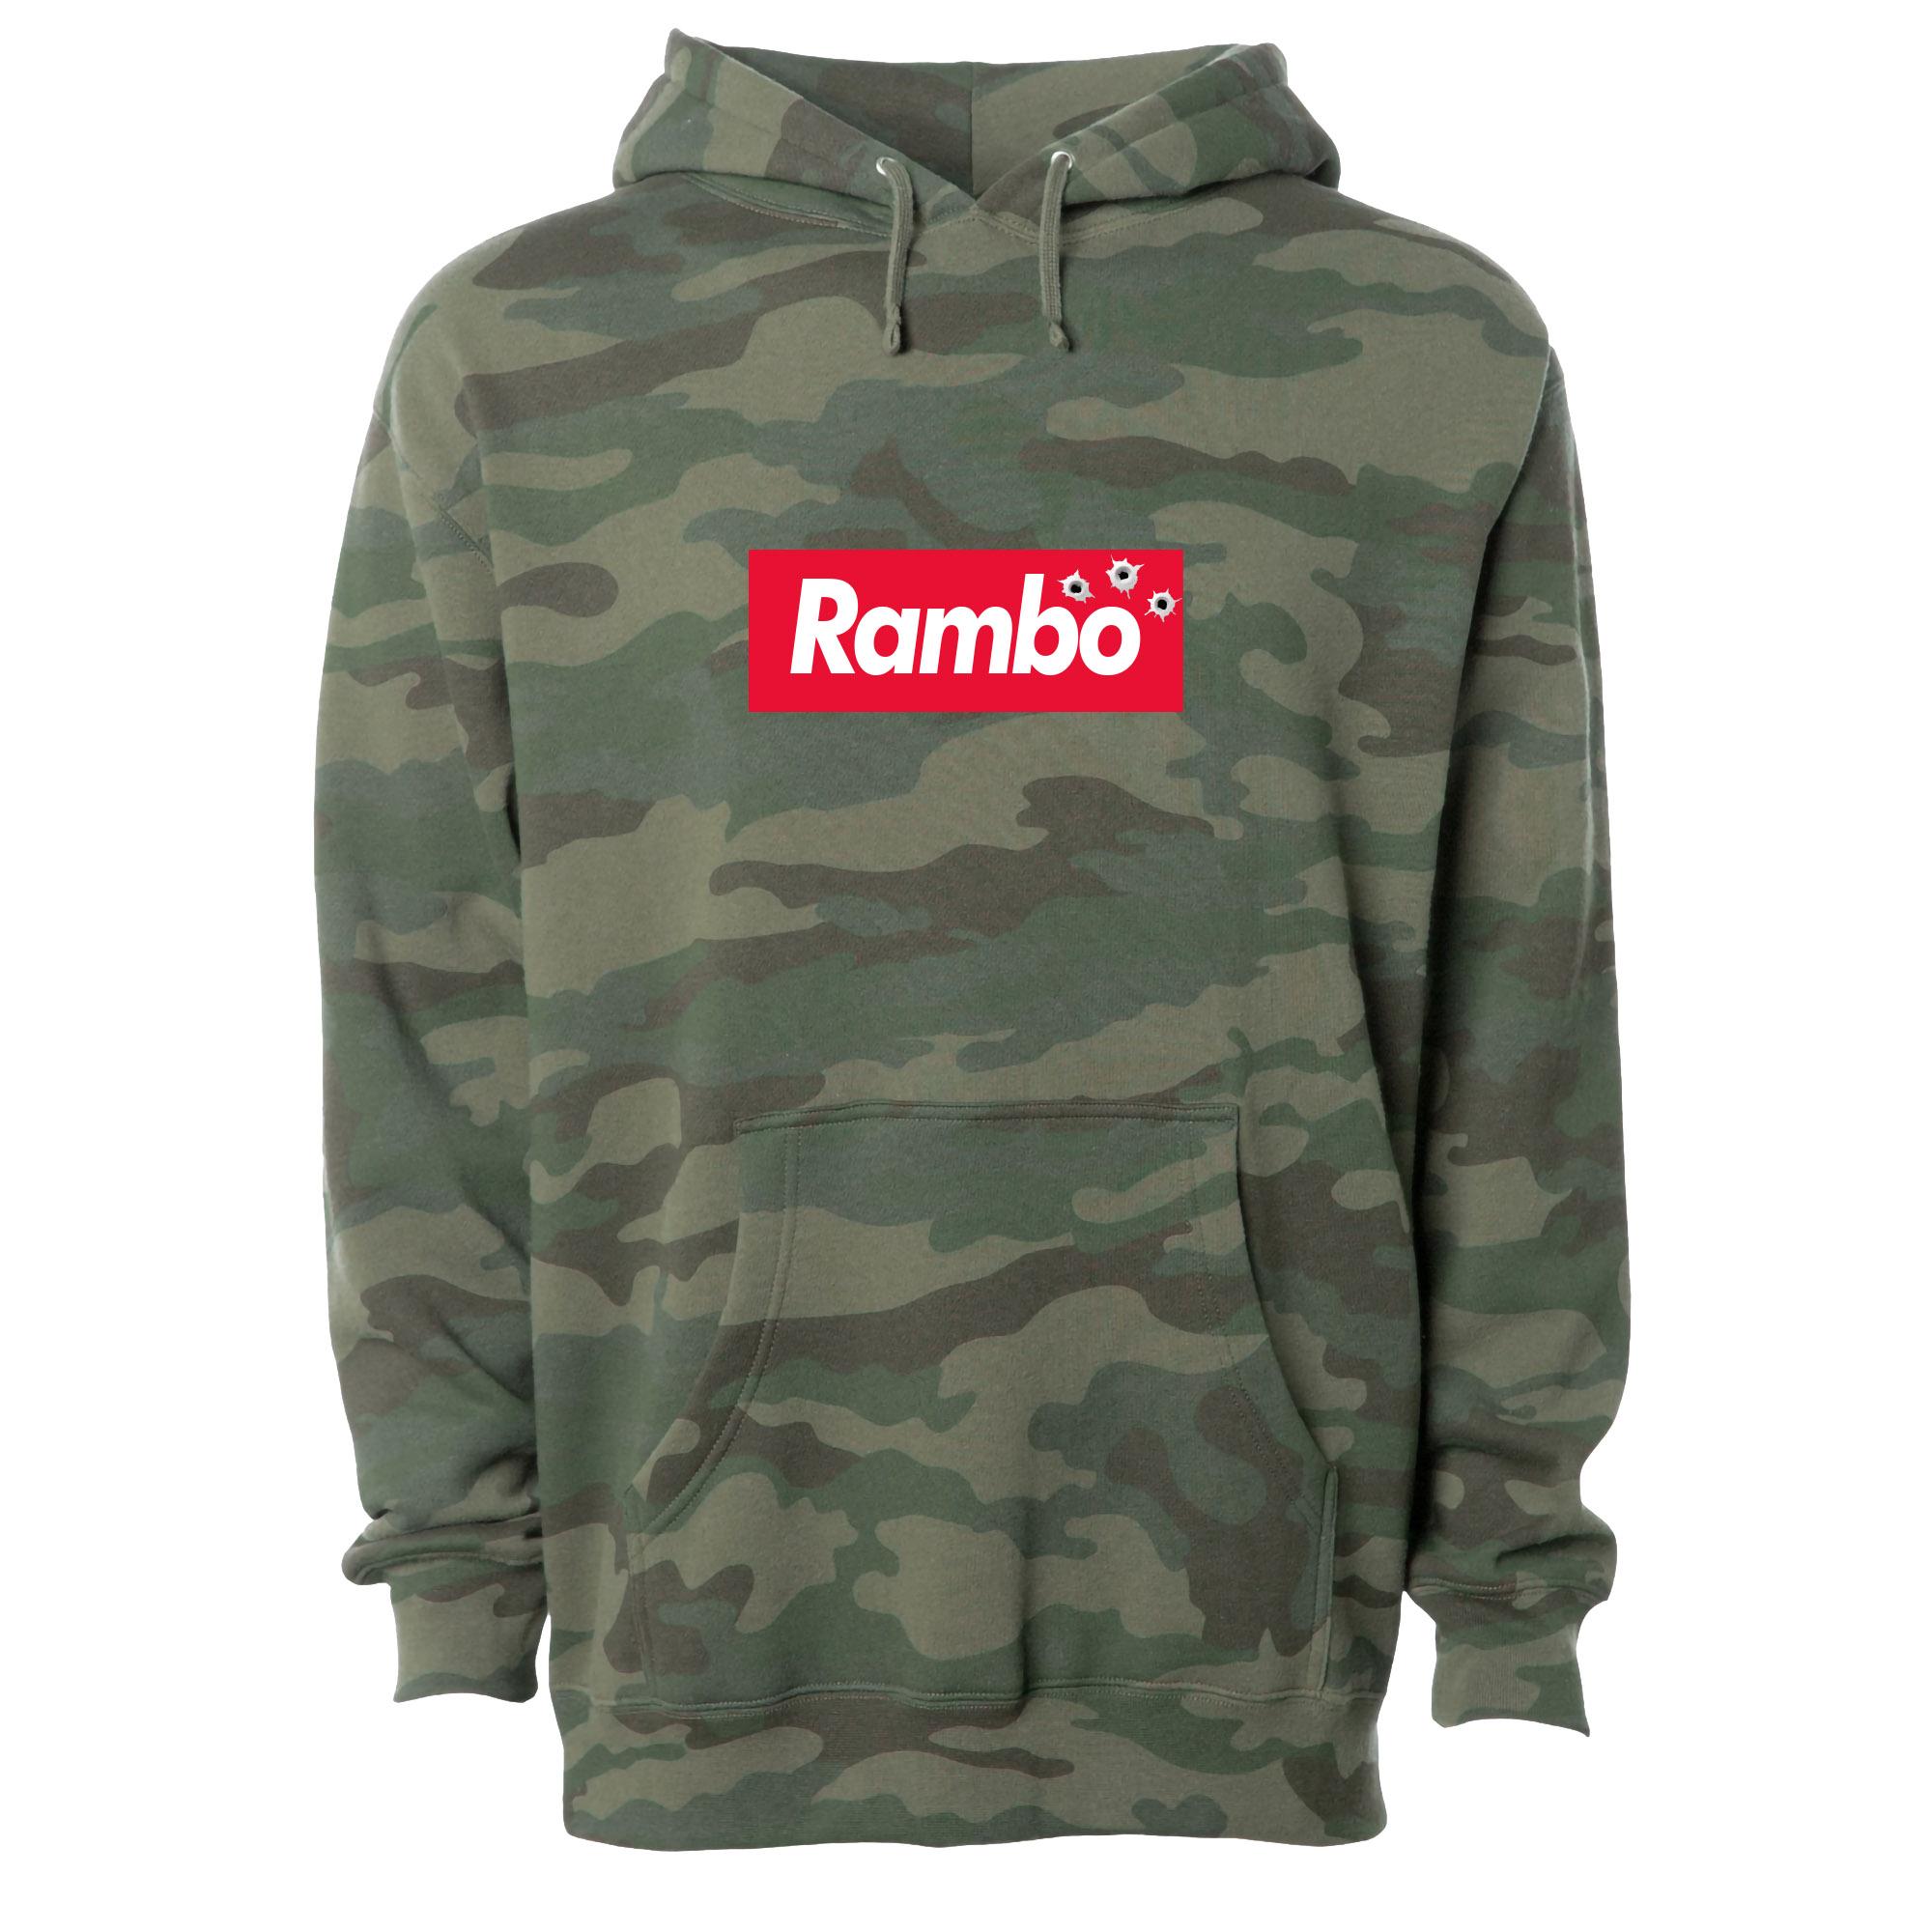 RAMBO Camo Pullover Hoodie